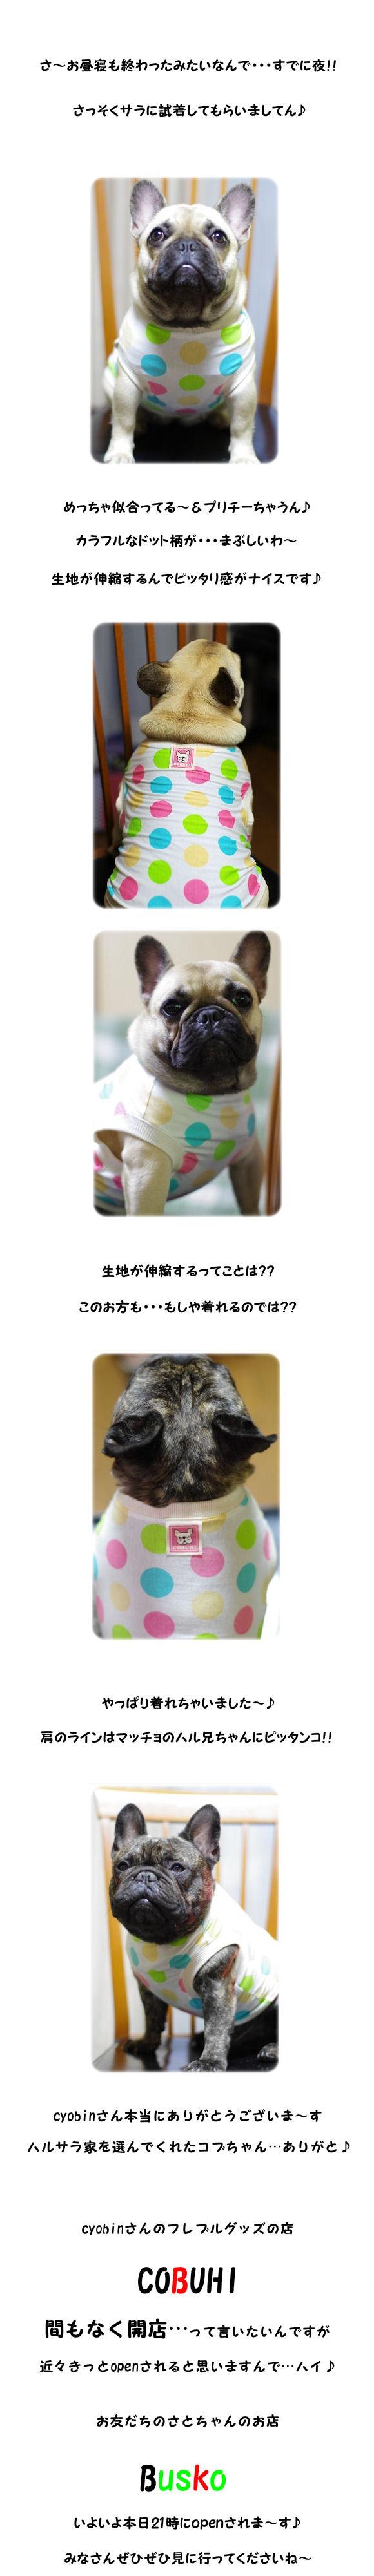 COBUHI2